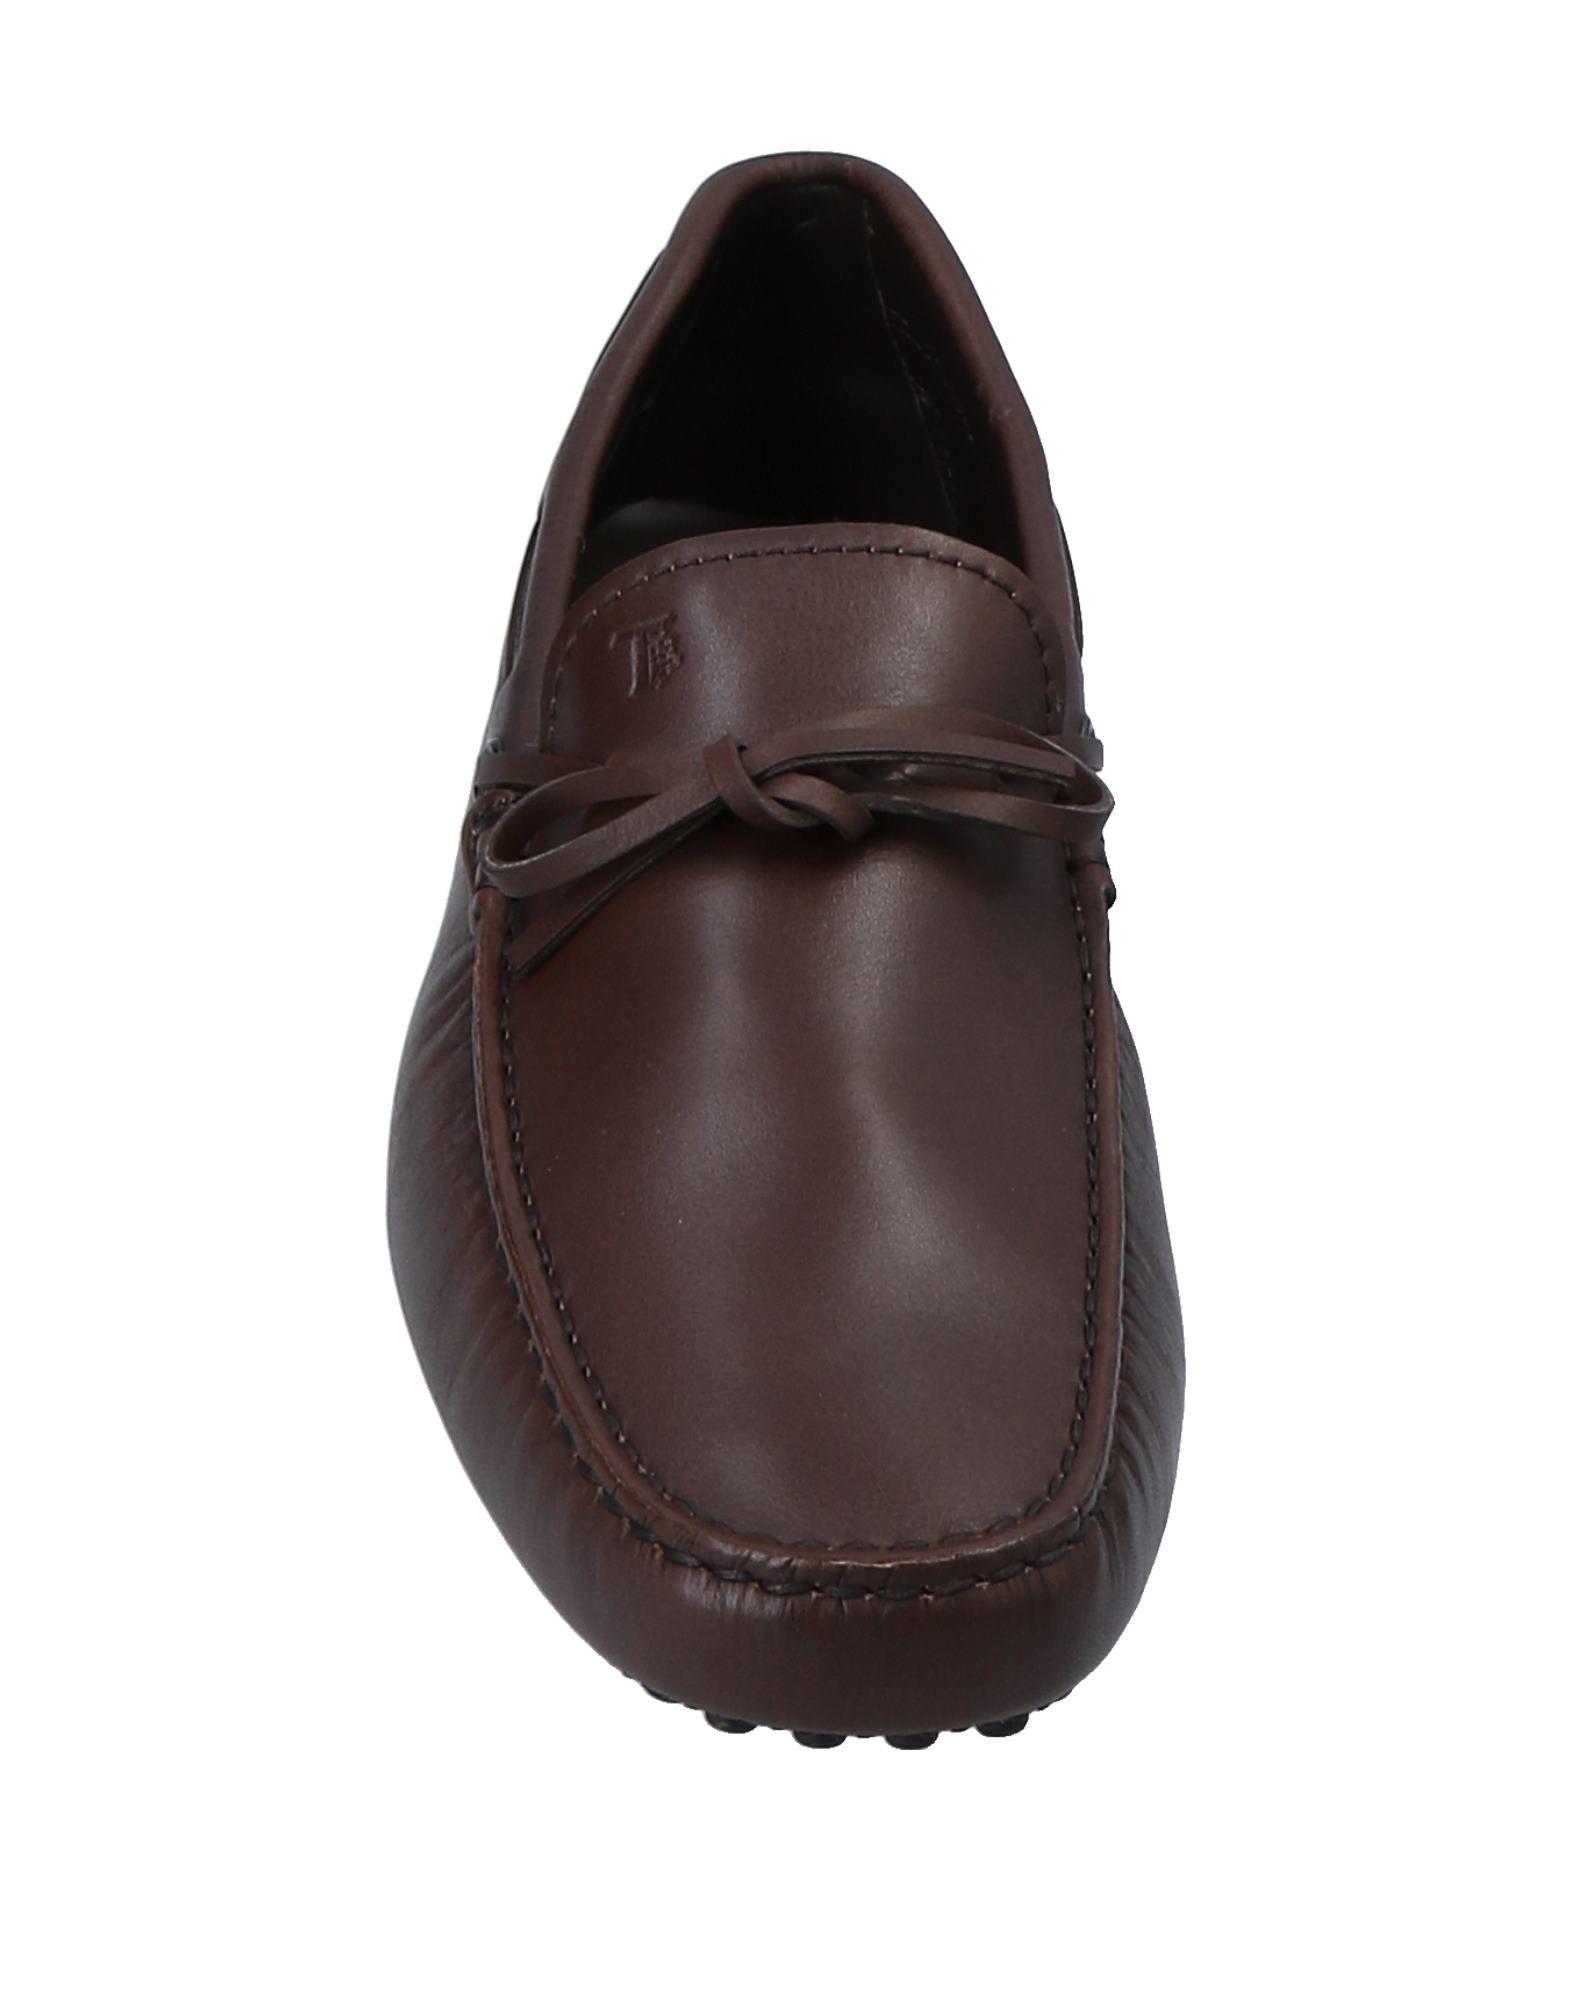 Tod's Mokassins Herren  11549146CB Gute Qualität beliebte Schuhe